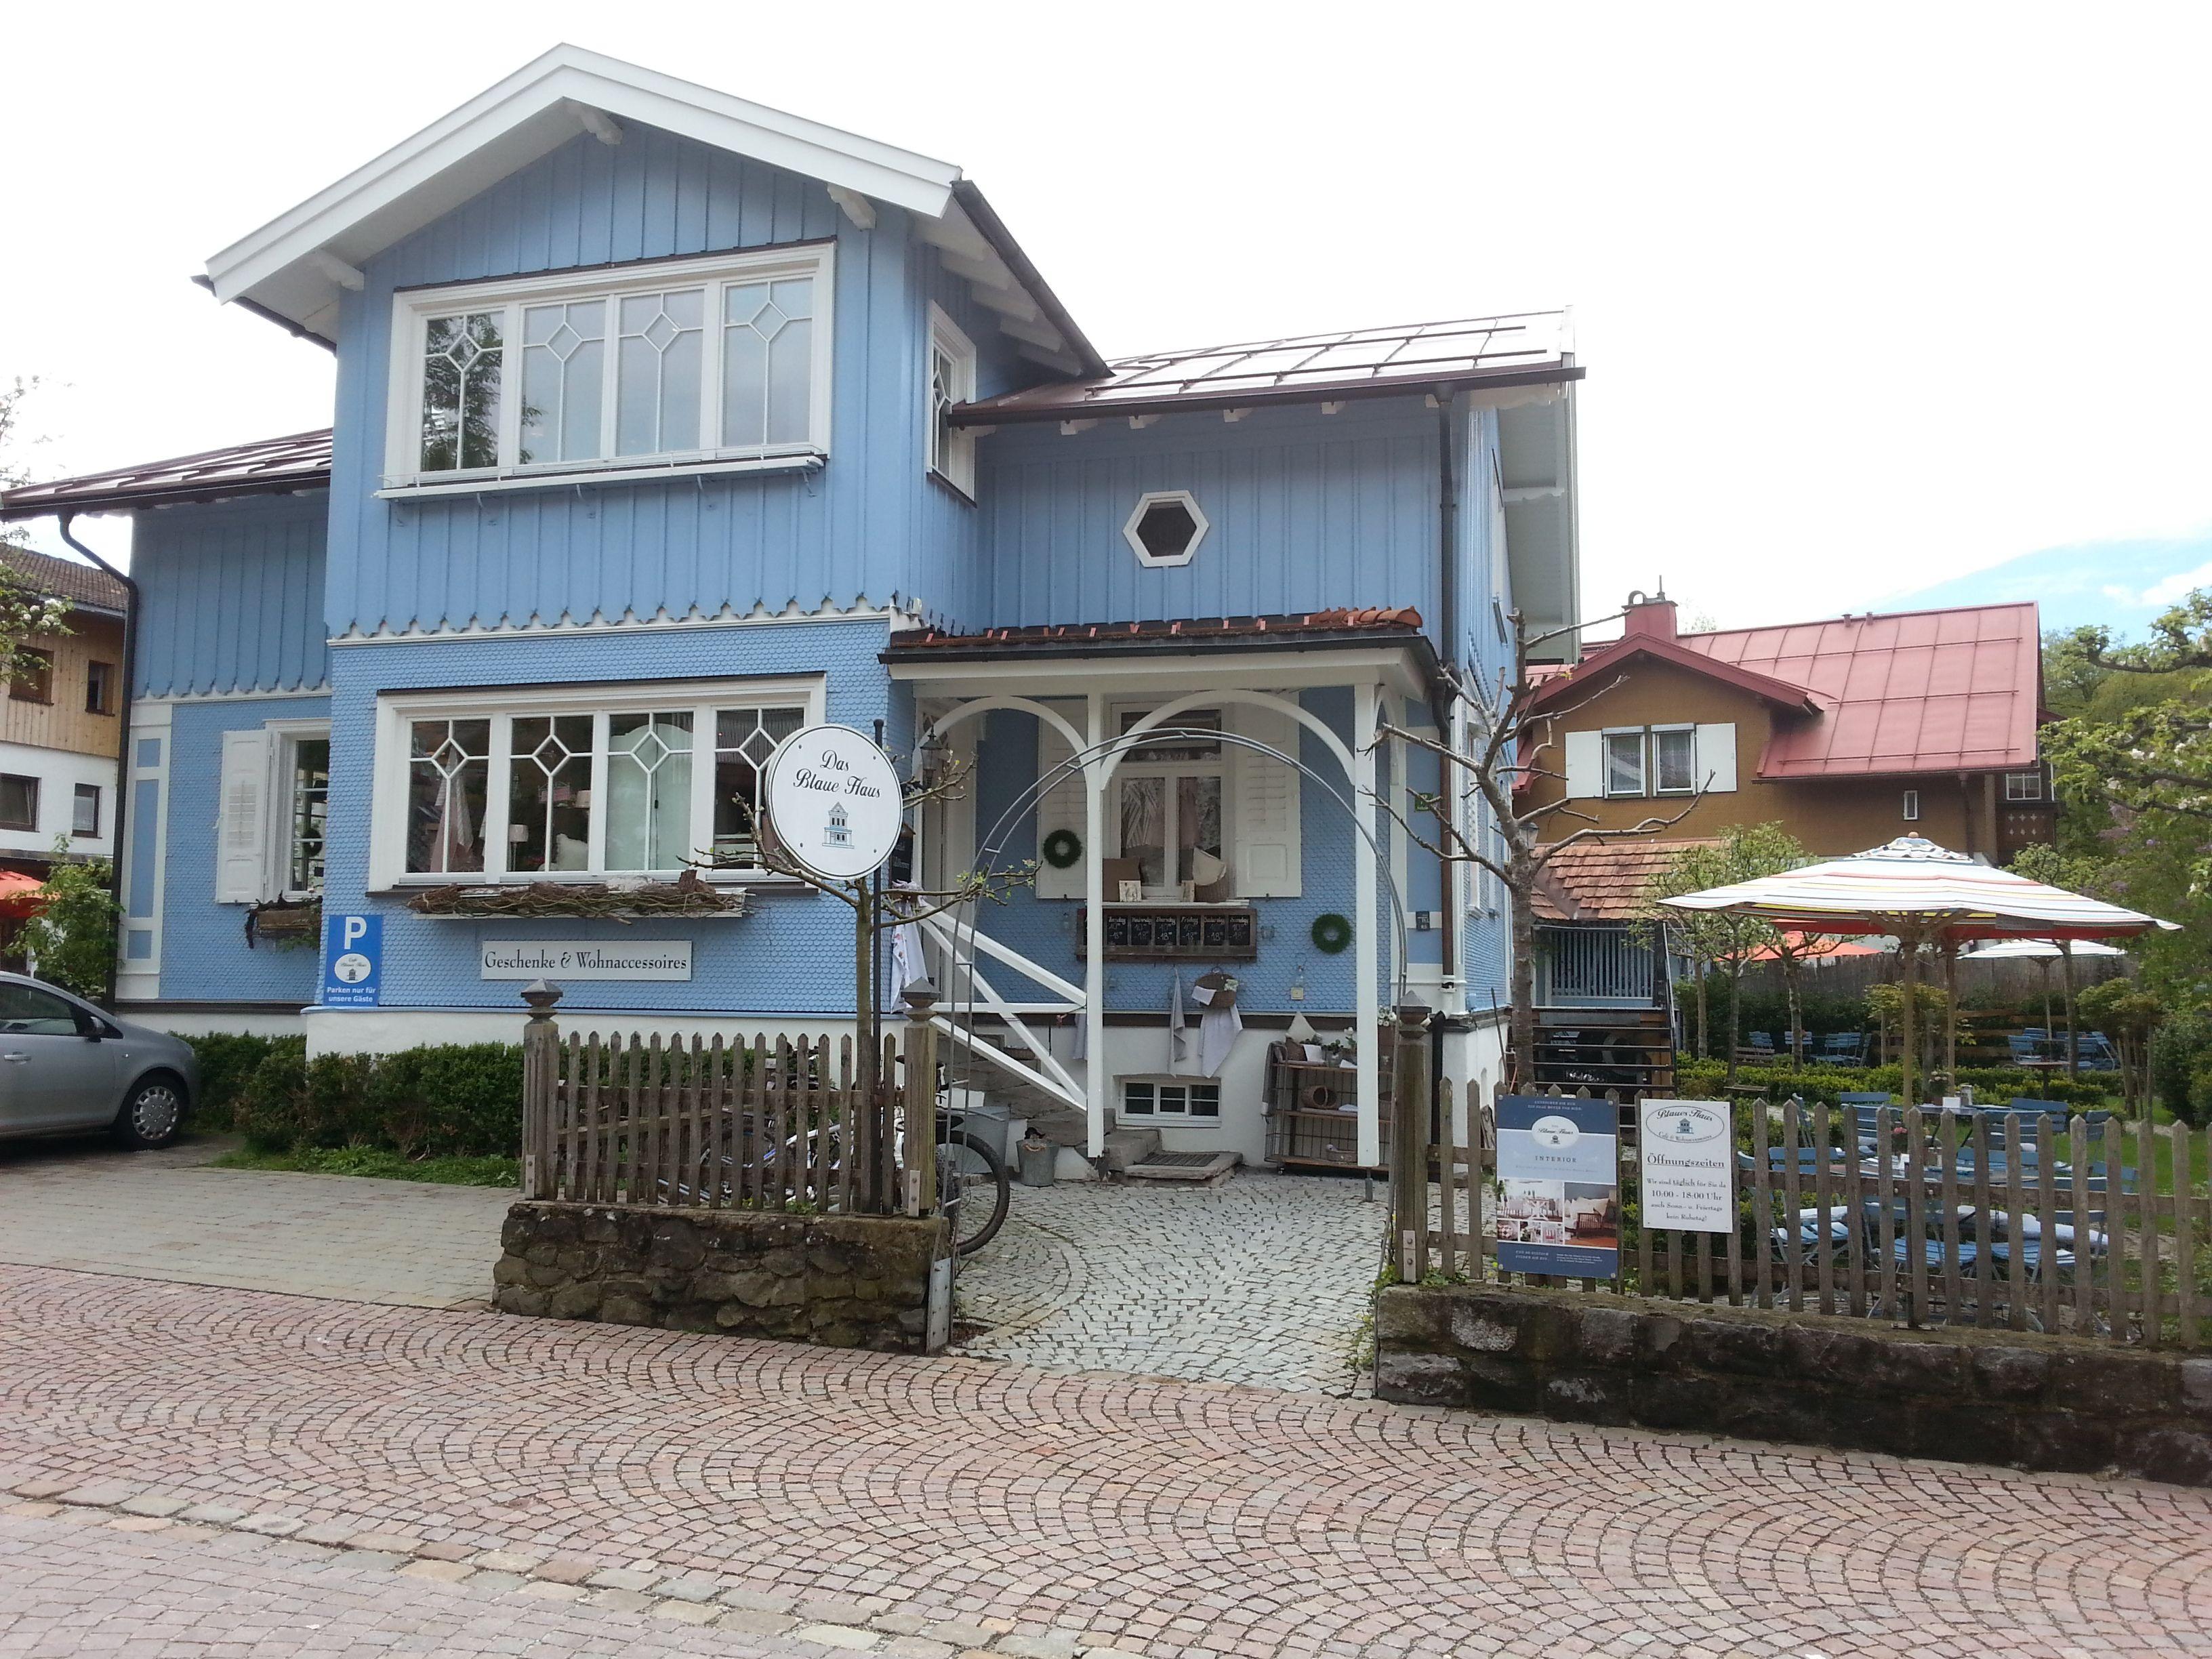 Blaue Häuser das blaue haus oberstaufen allgäu germany cities and castle